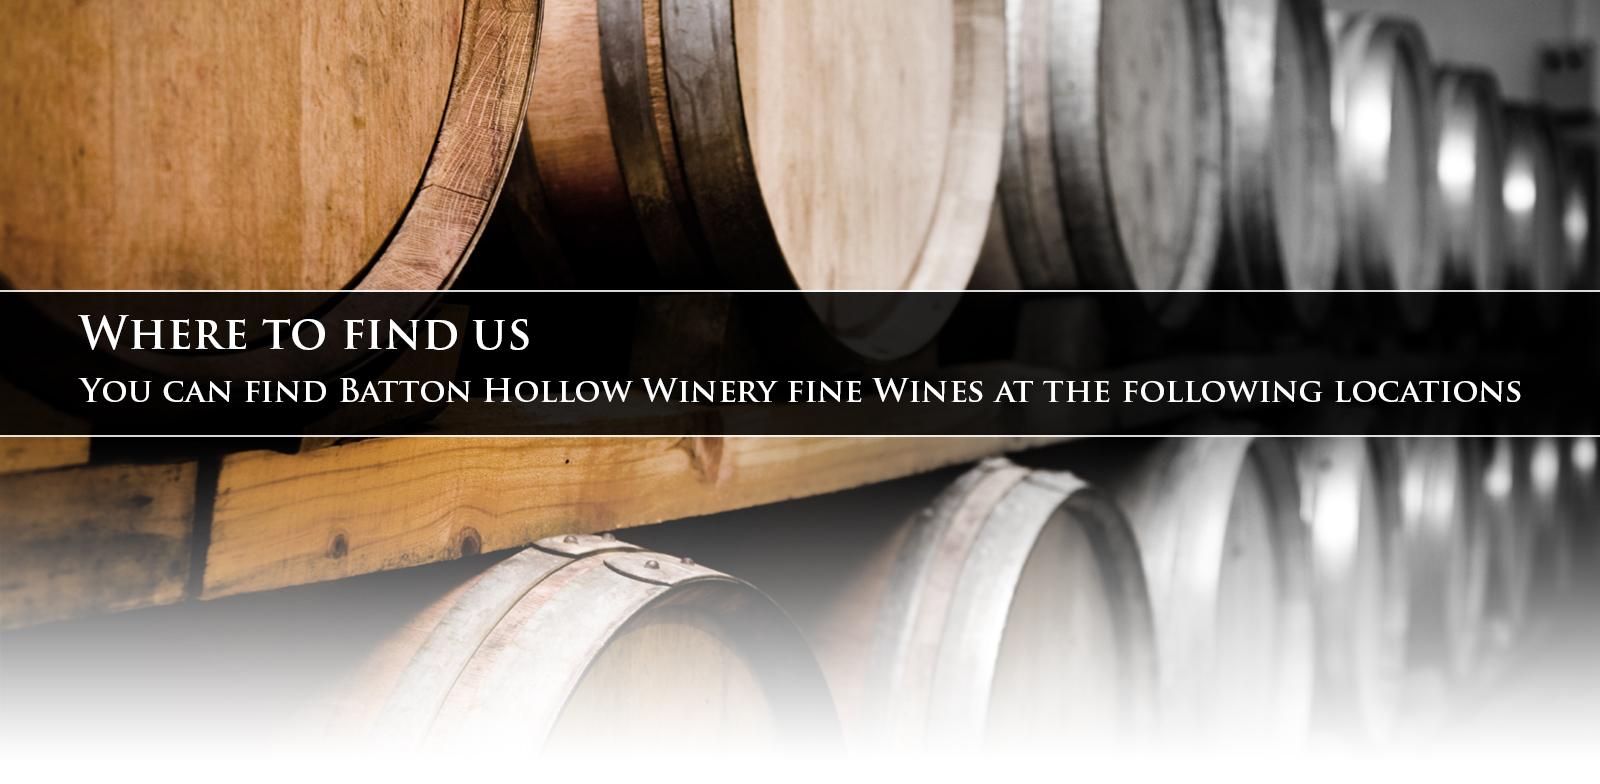 BATTON-HOLLOW-WEBSITE-where-to-find-us.jpg